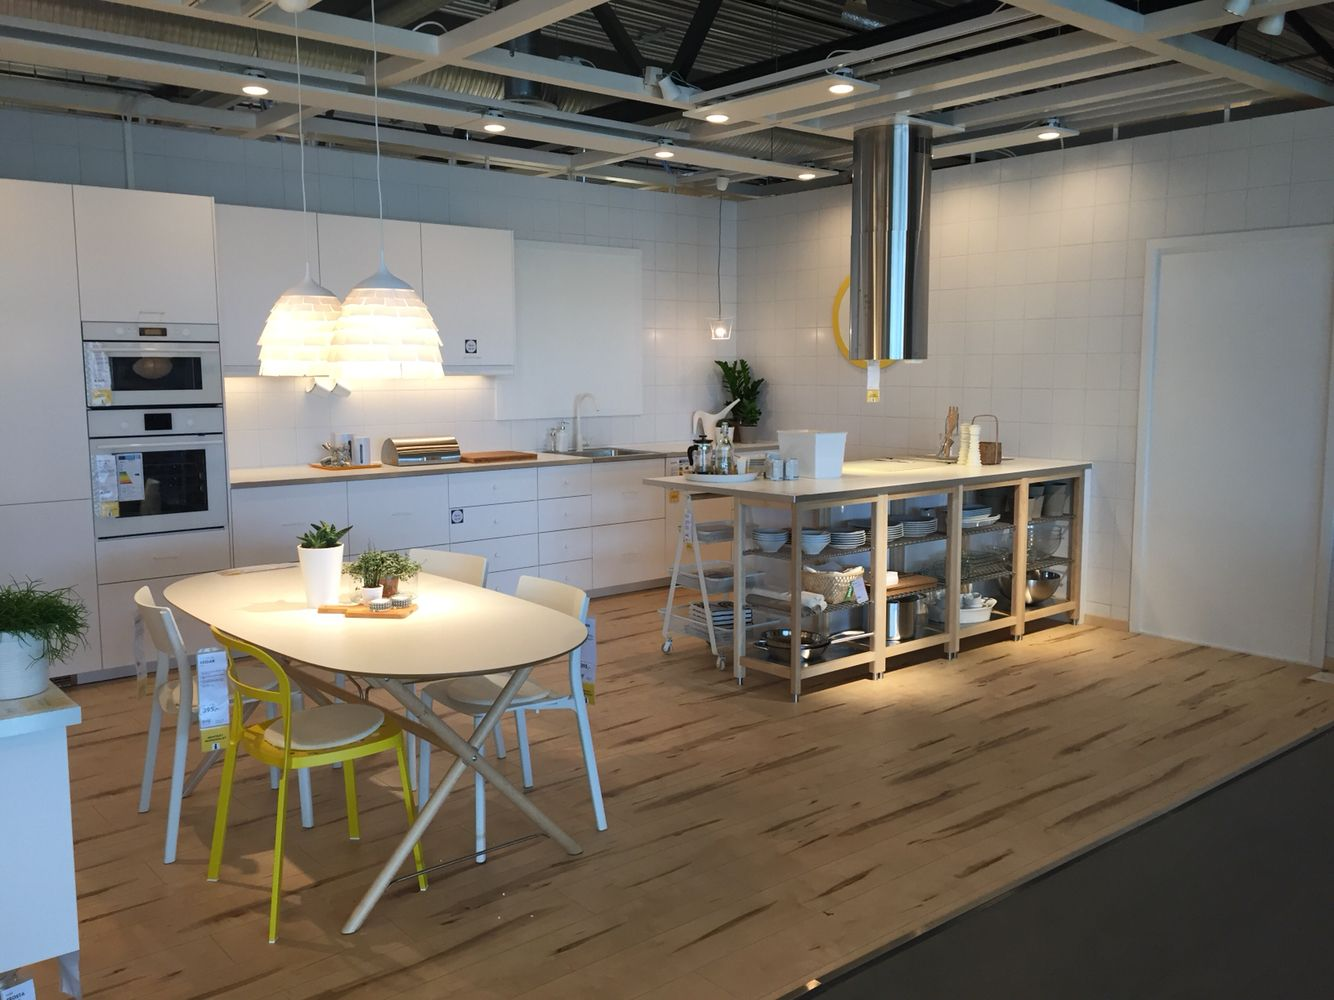 My First Kitchen New product SKÄRALID IKEA SKÄRALID catalogue 2016 ...